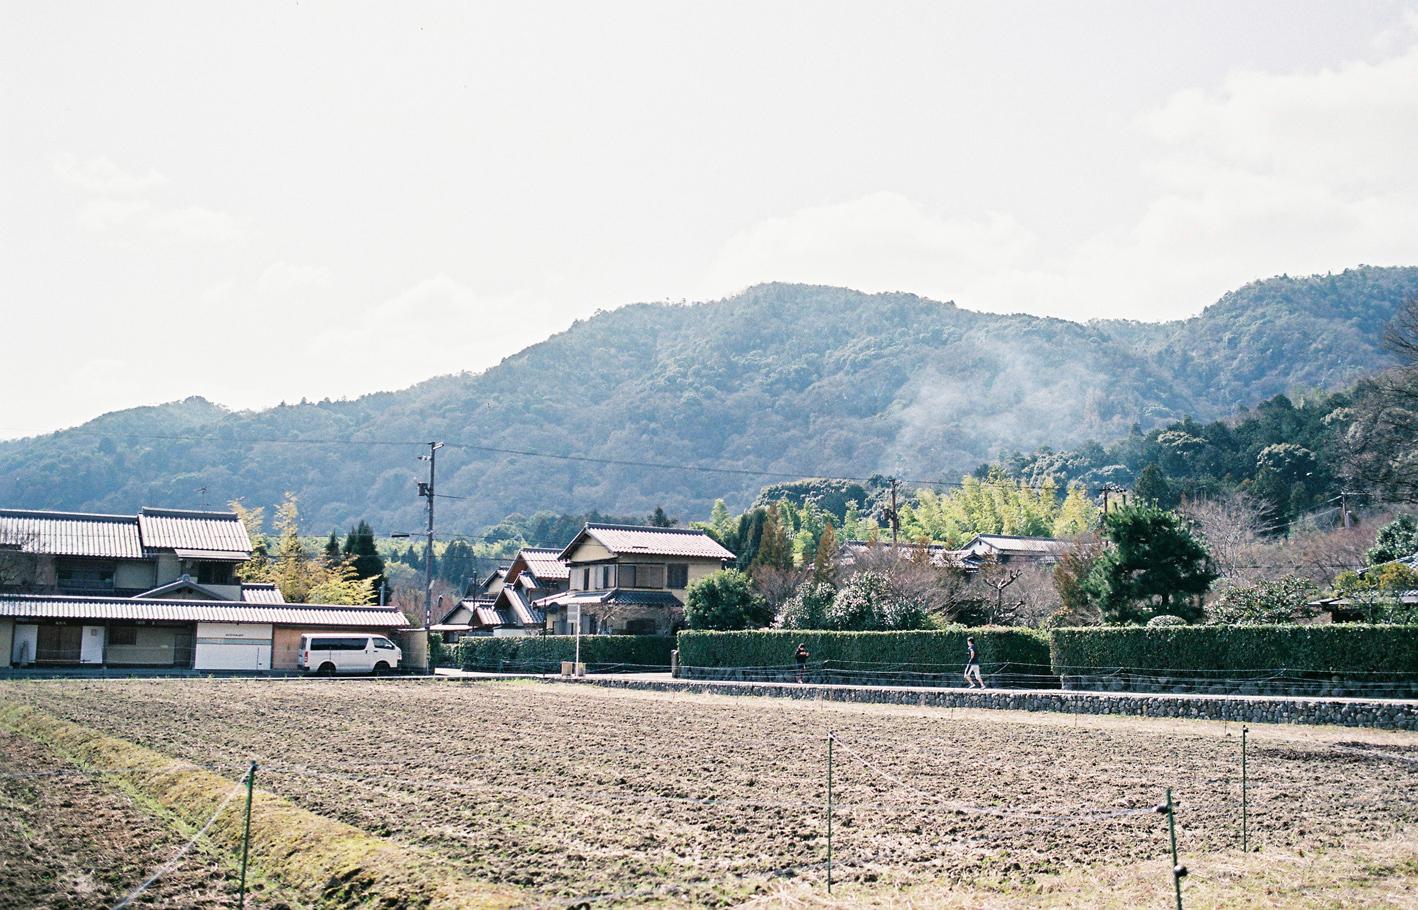 012-kyoto-arashiyama-sophie-baker-photography